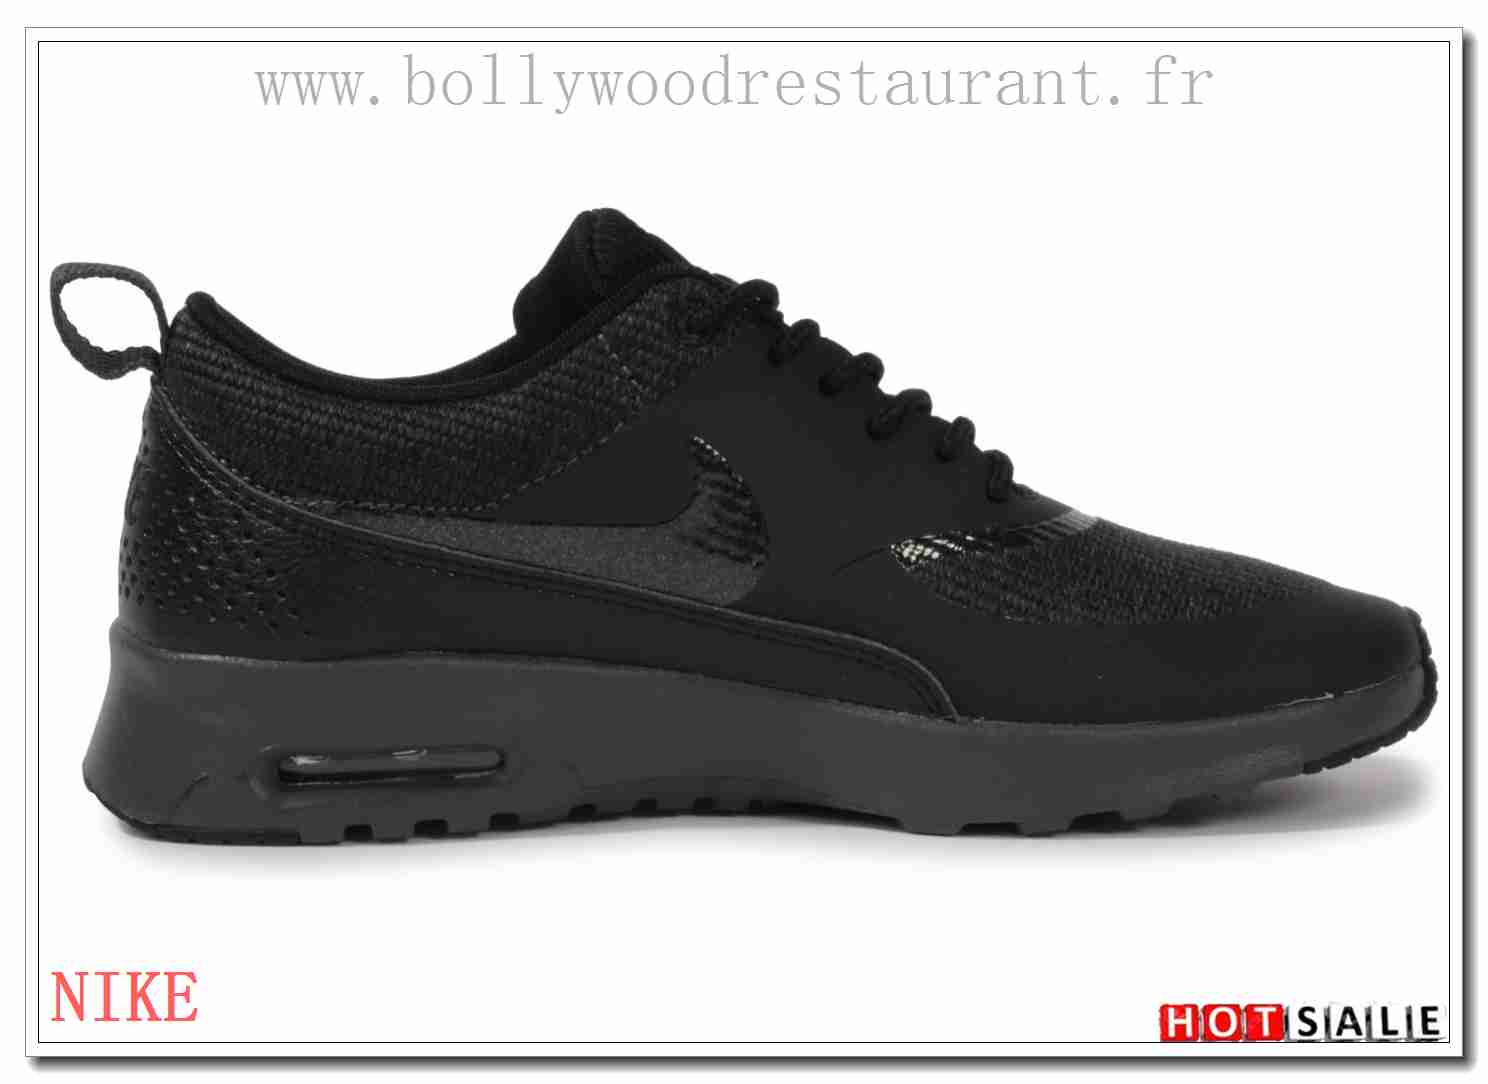 separation shoes a386b 4723e nike air max thea homme 2018